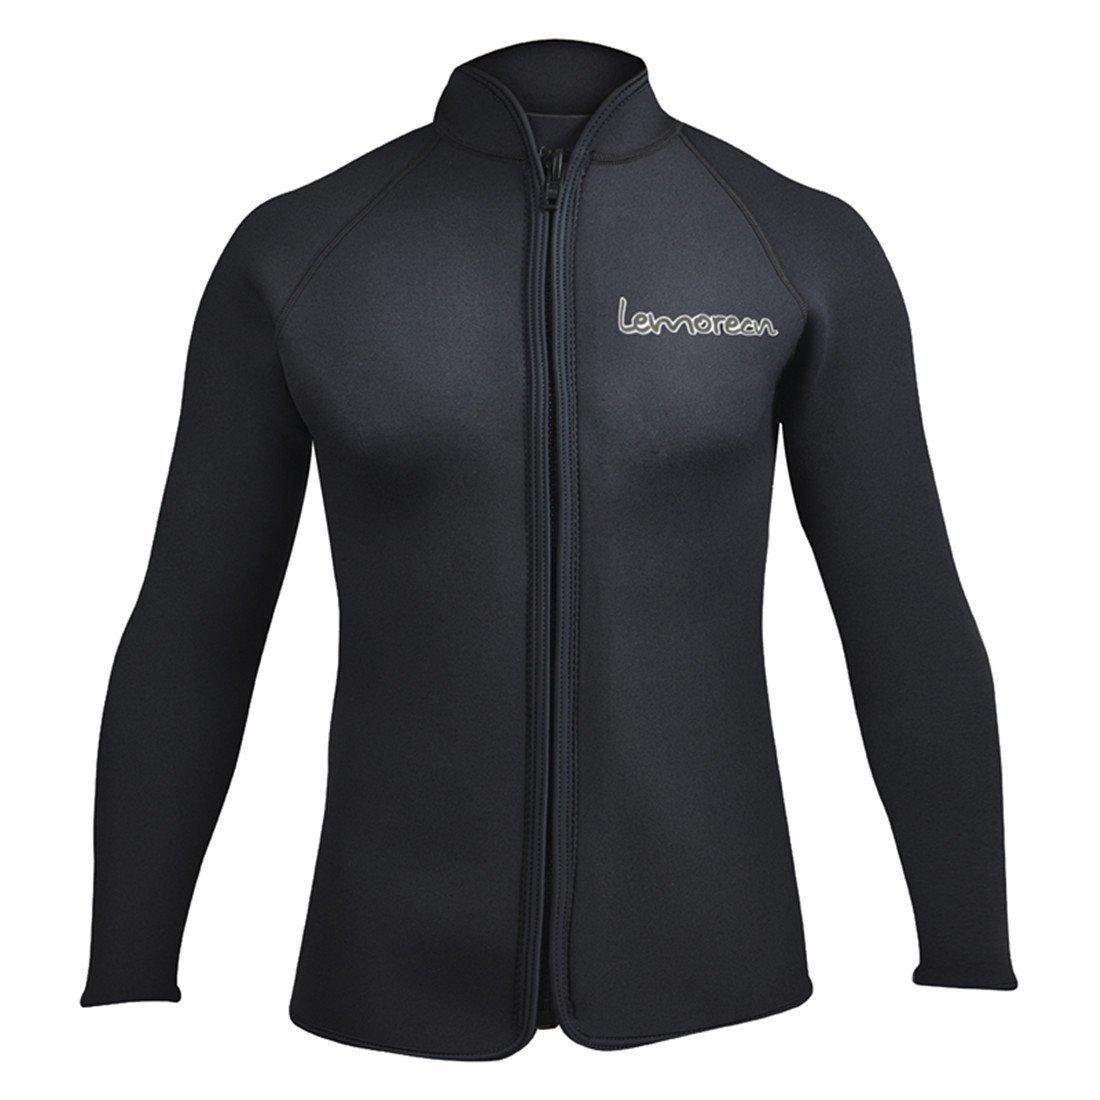 Lemorecn Adult's 3mm Wetsuits Jacket Long Sleeve Neoprene Wetsuits Top US Size (Black, 3XLarge)